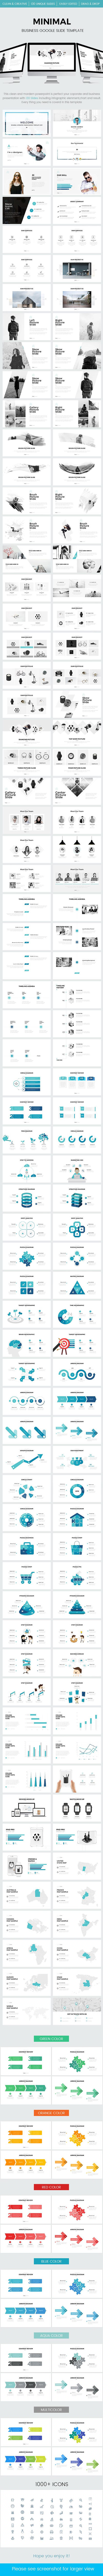 Minimal Business Google Slides Template - Google Slides Presentation Templates